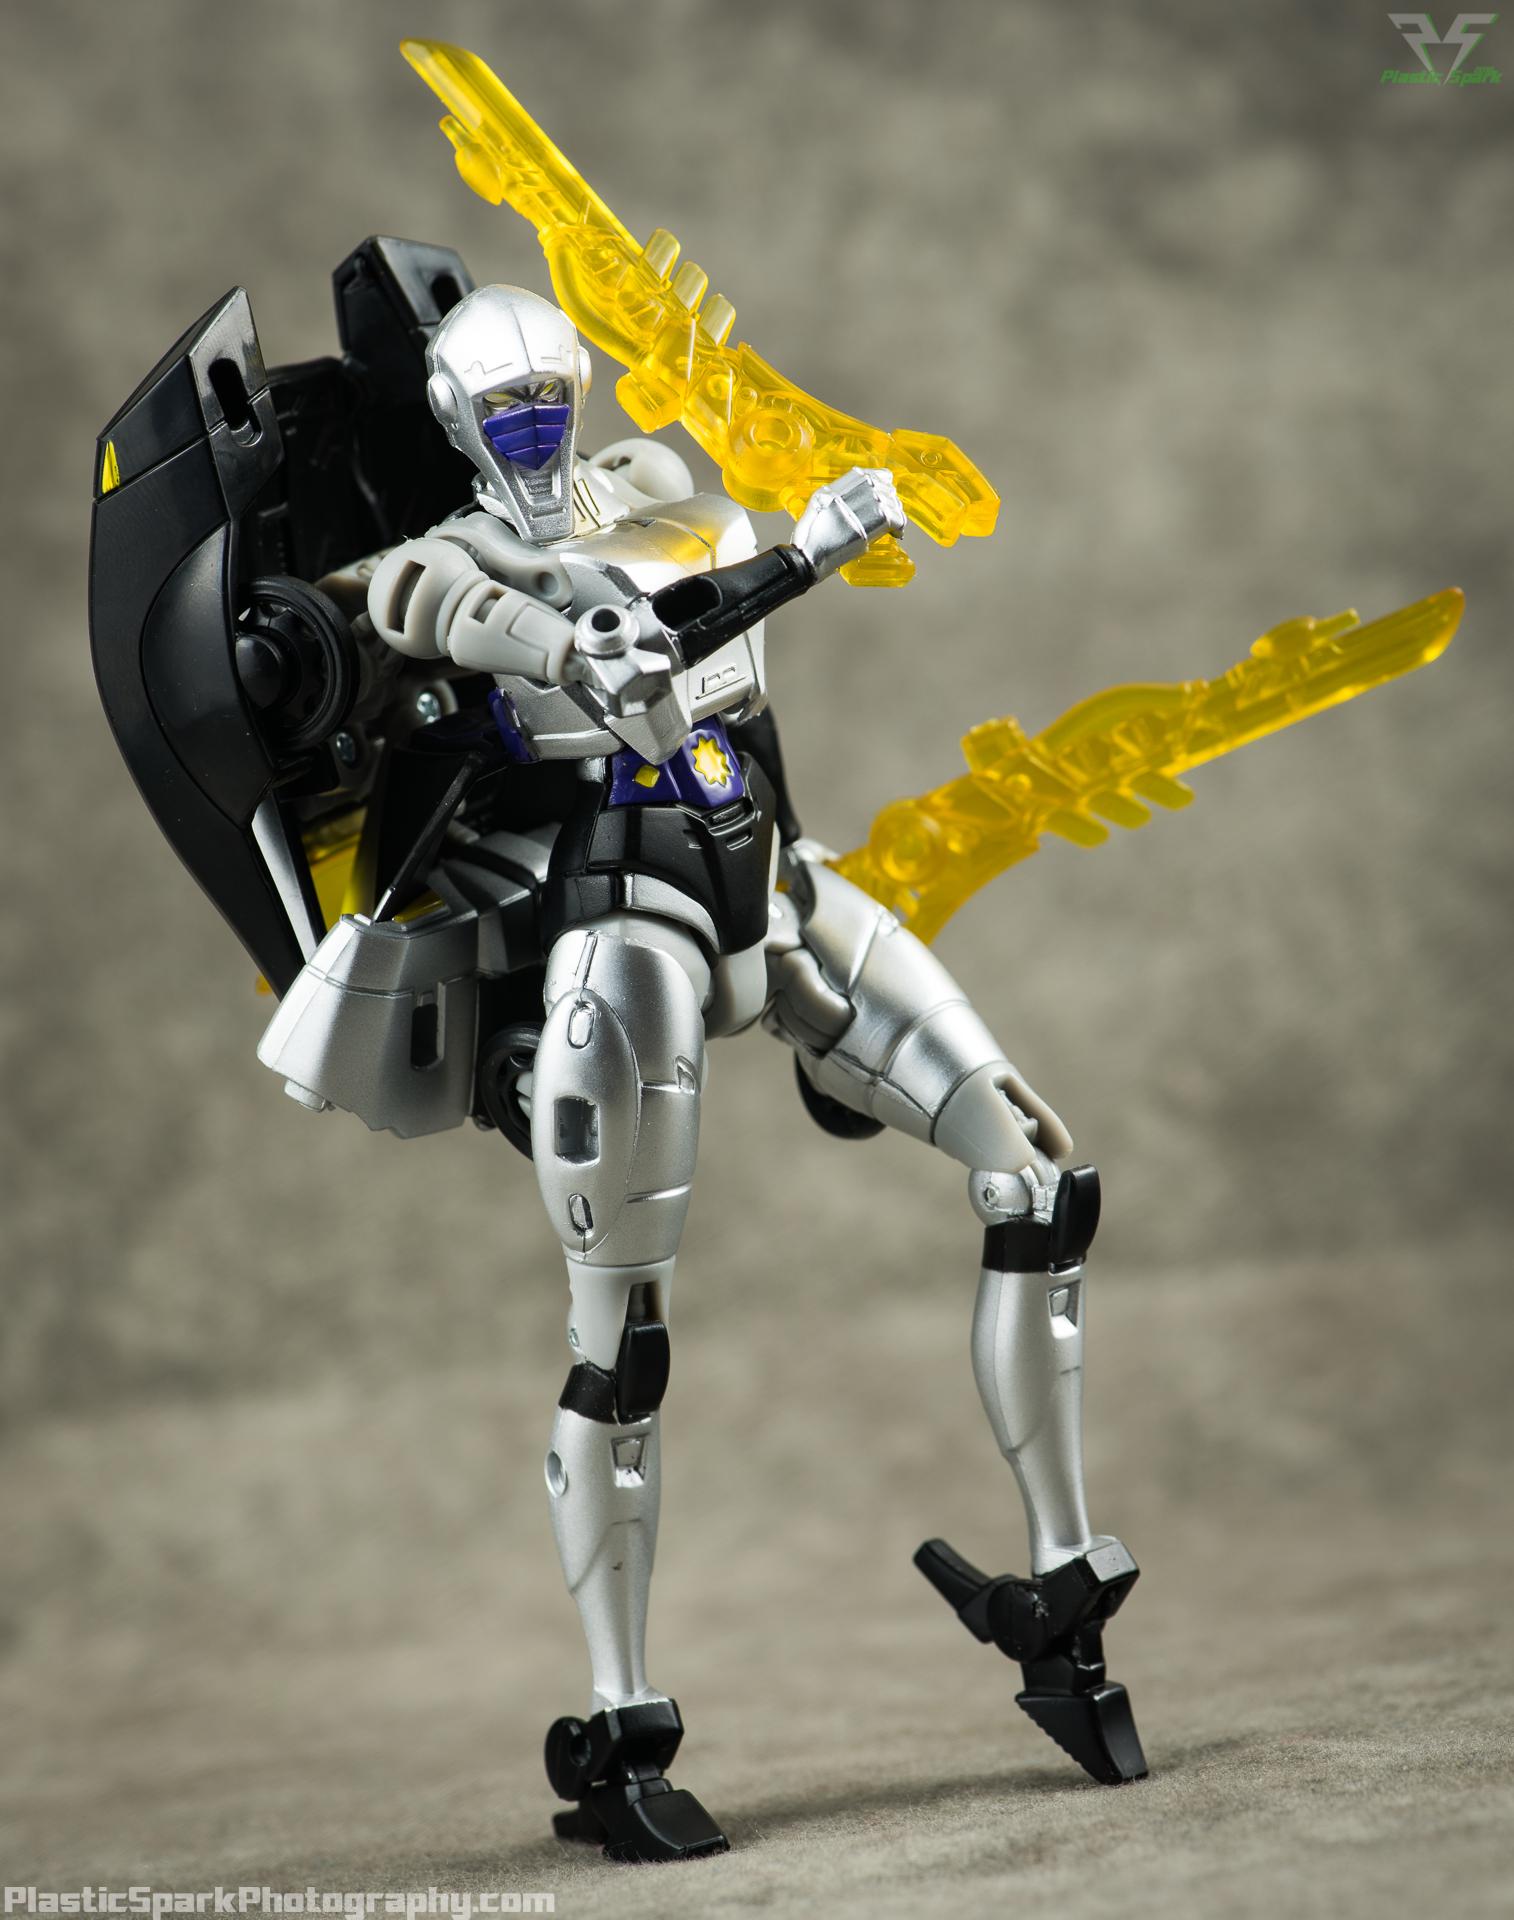 Takara-LG15-Nightbird-Shadow-(6-of-11).png